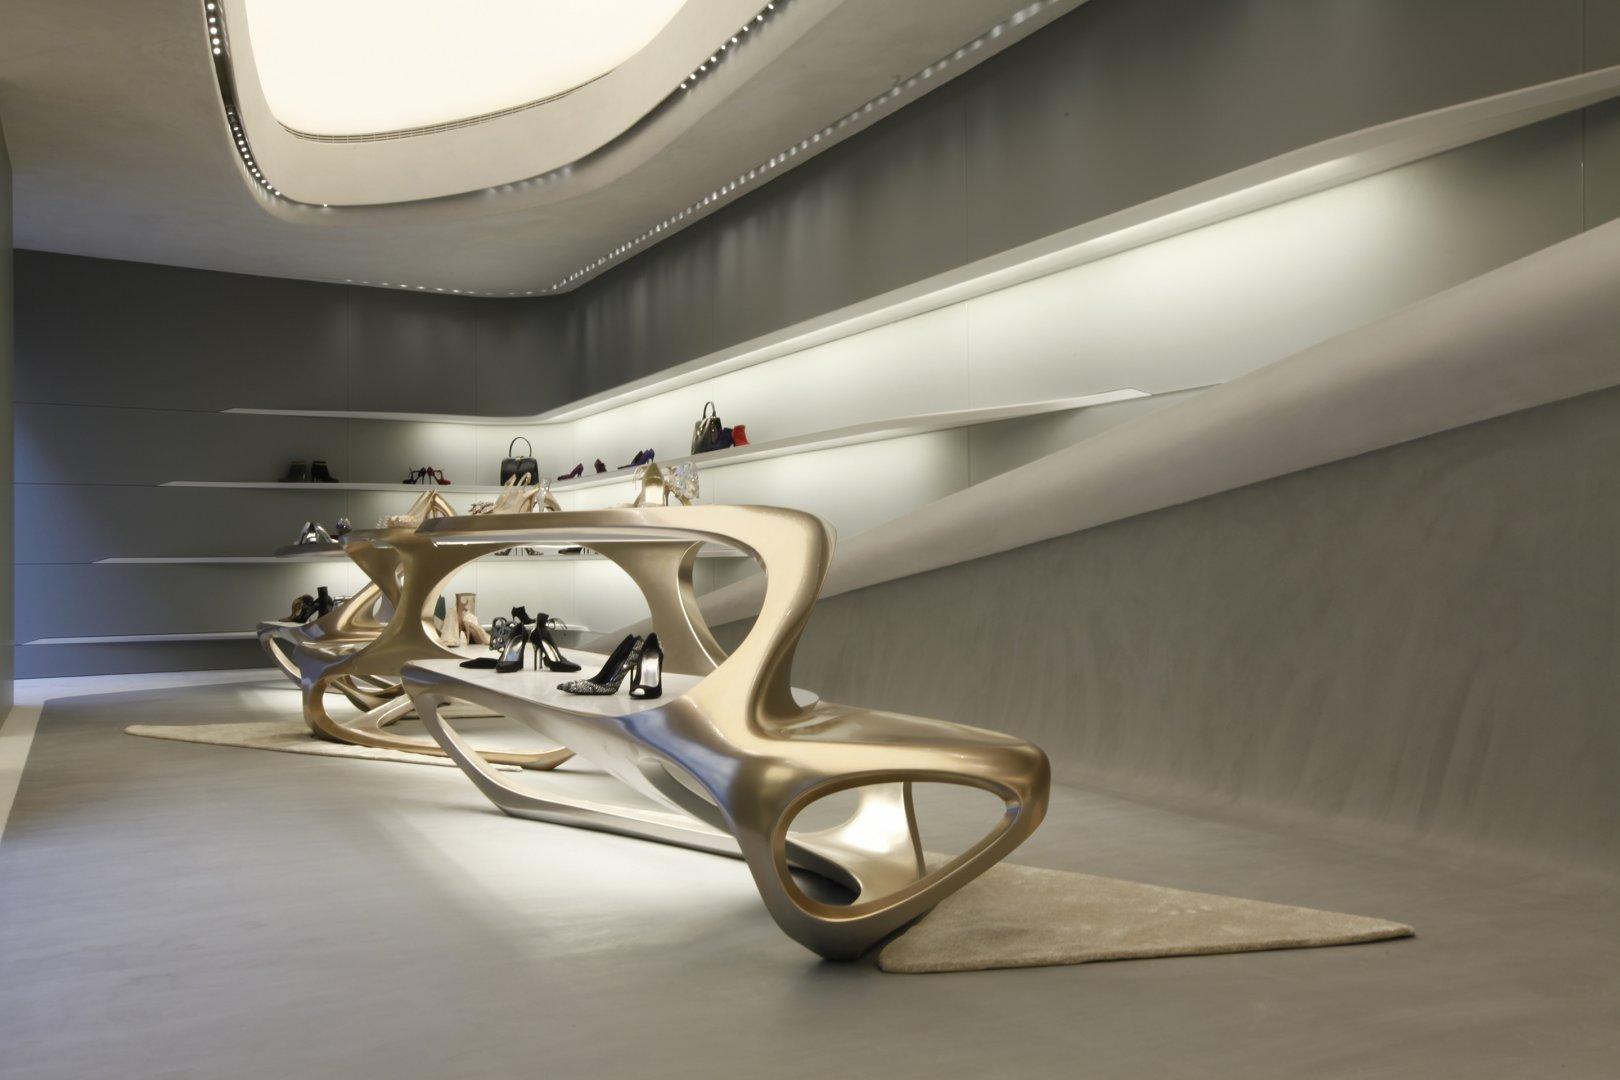 Stuart weitzman flagship store by zaha hadid for Design milano